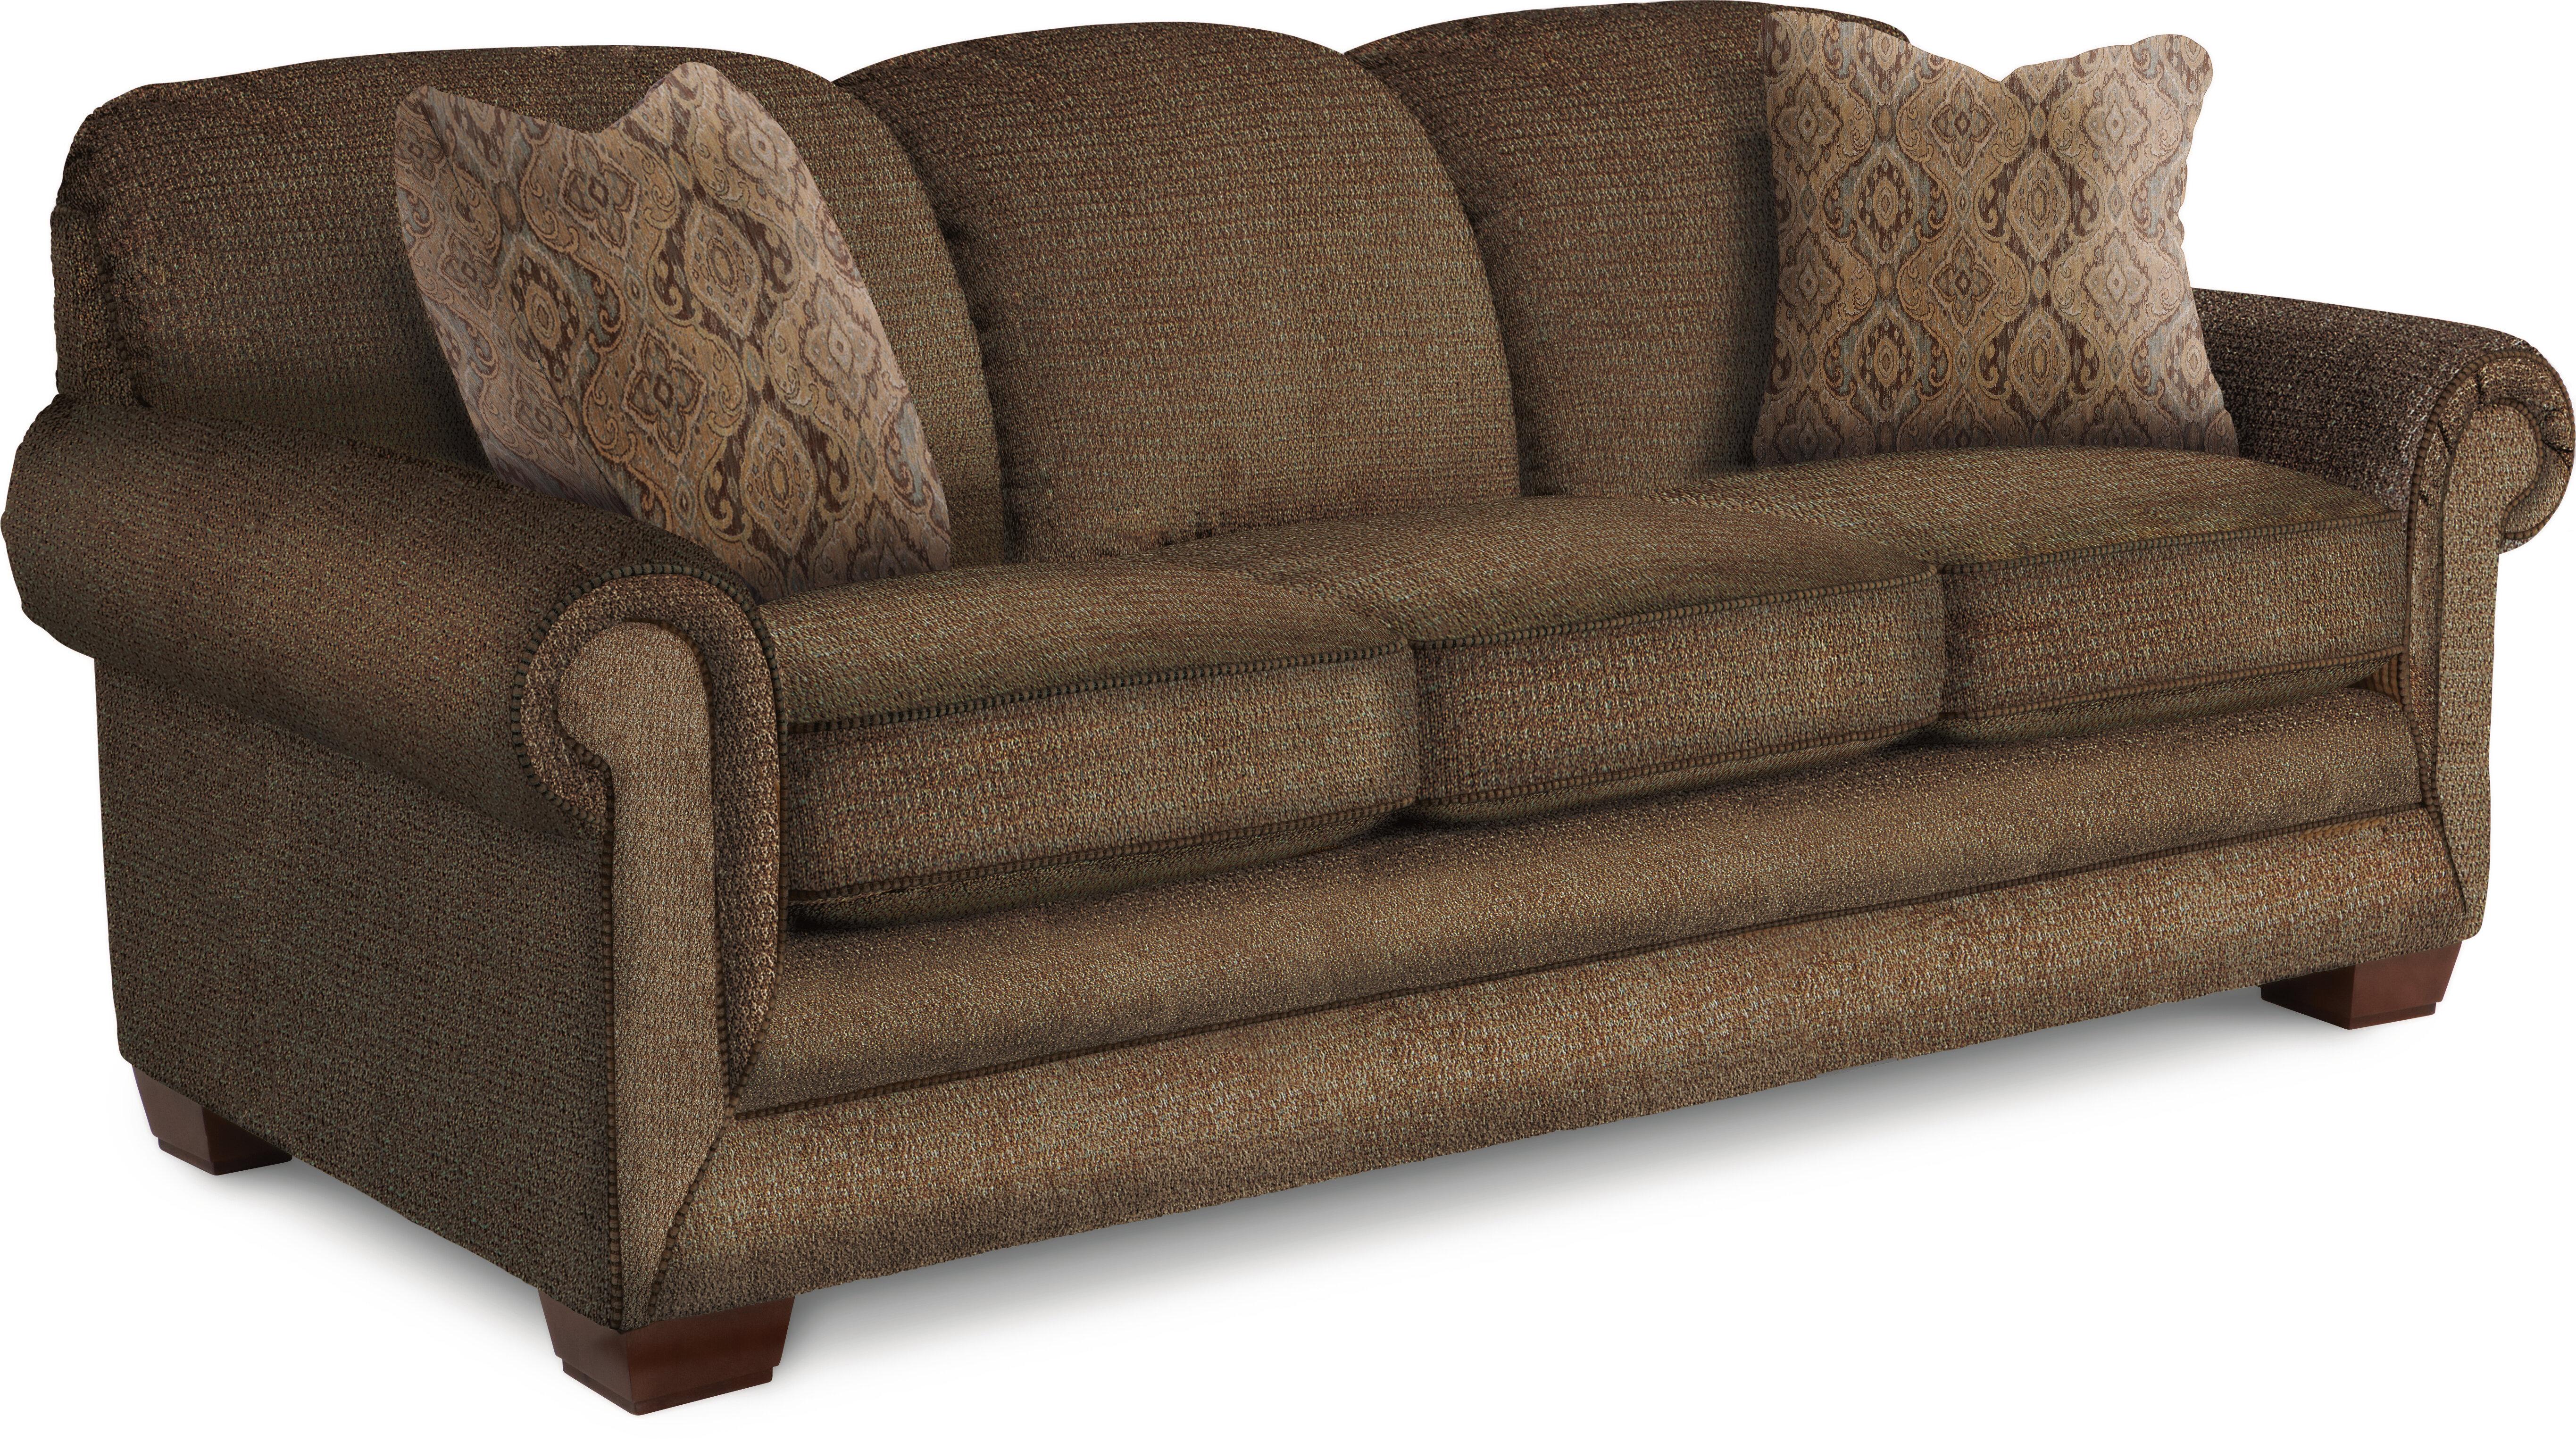 Surprising La Z Boy Mackenzie Premier Sofa Reviews Wayfair Dailytribune Chair Design For Home Dailytribuneorg